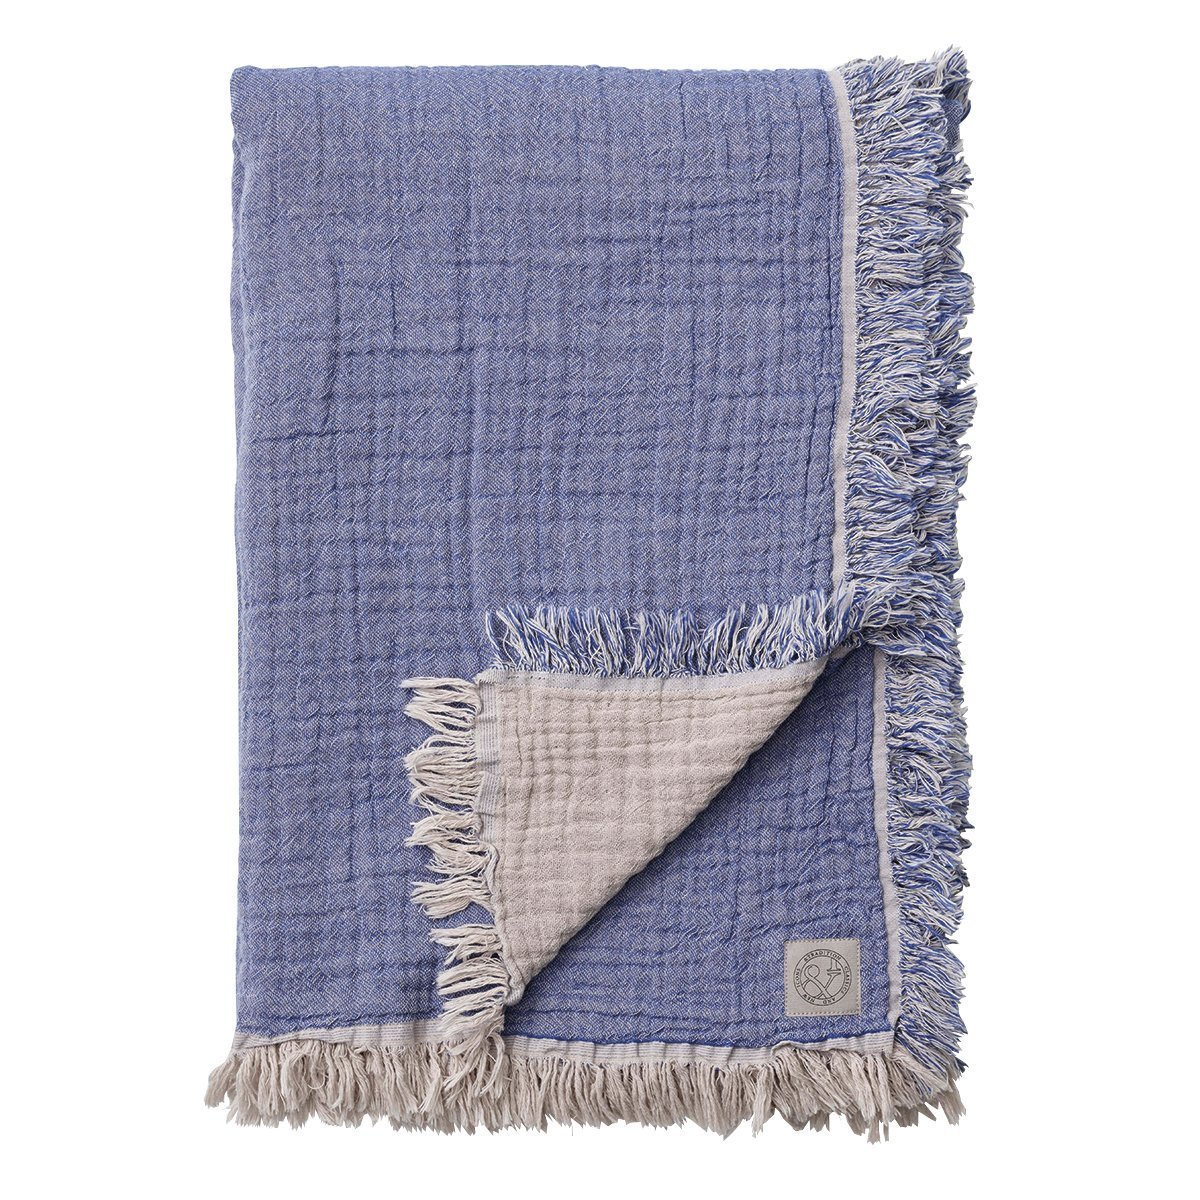 &Tradition Cotton Throw Deken Blauw - 140 x 210 cm.